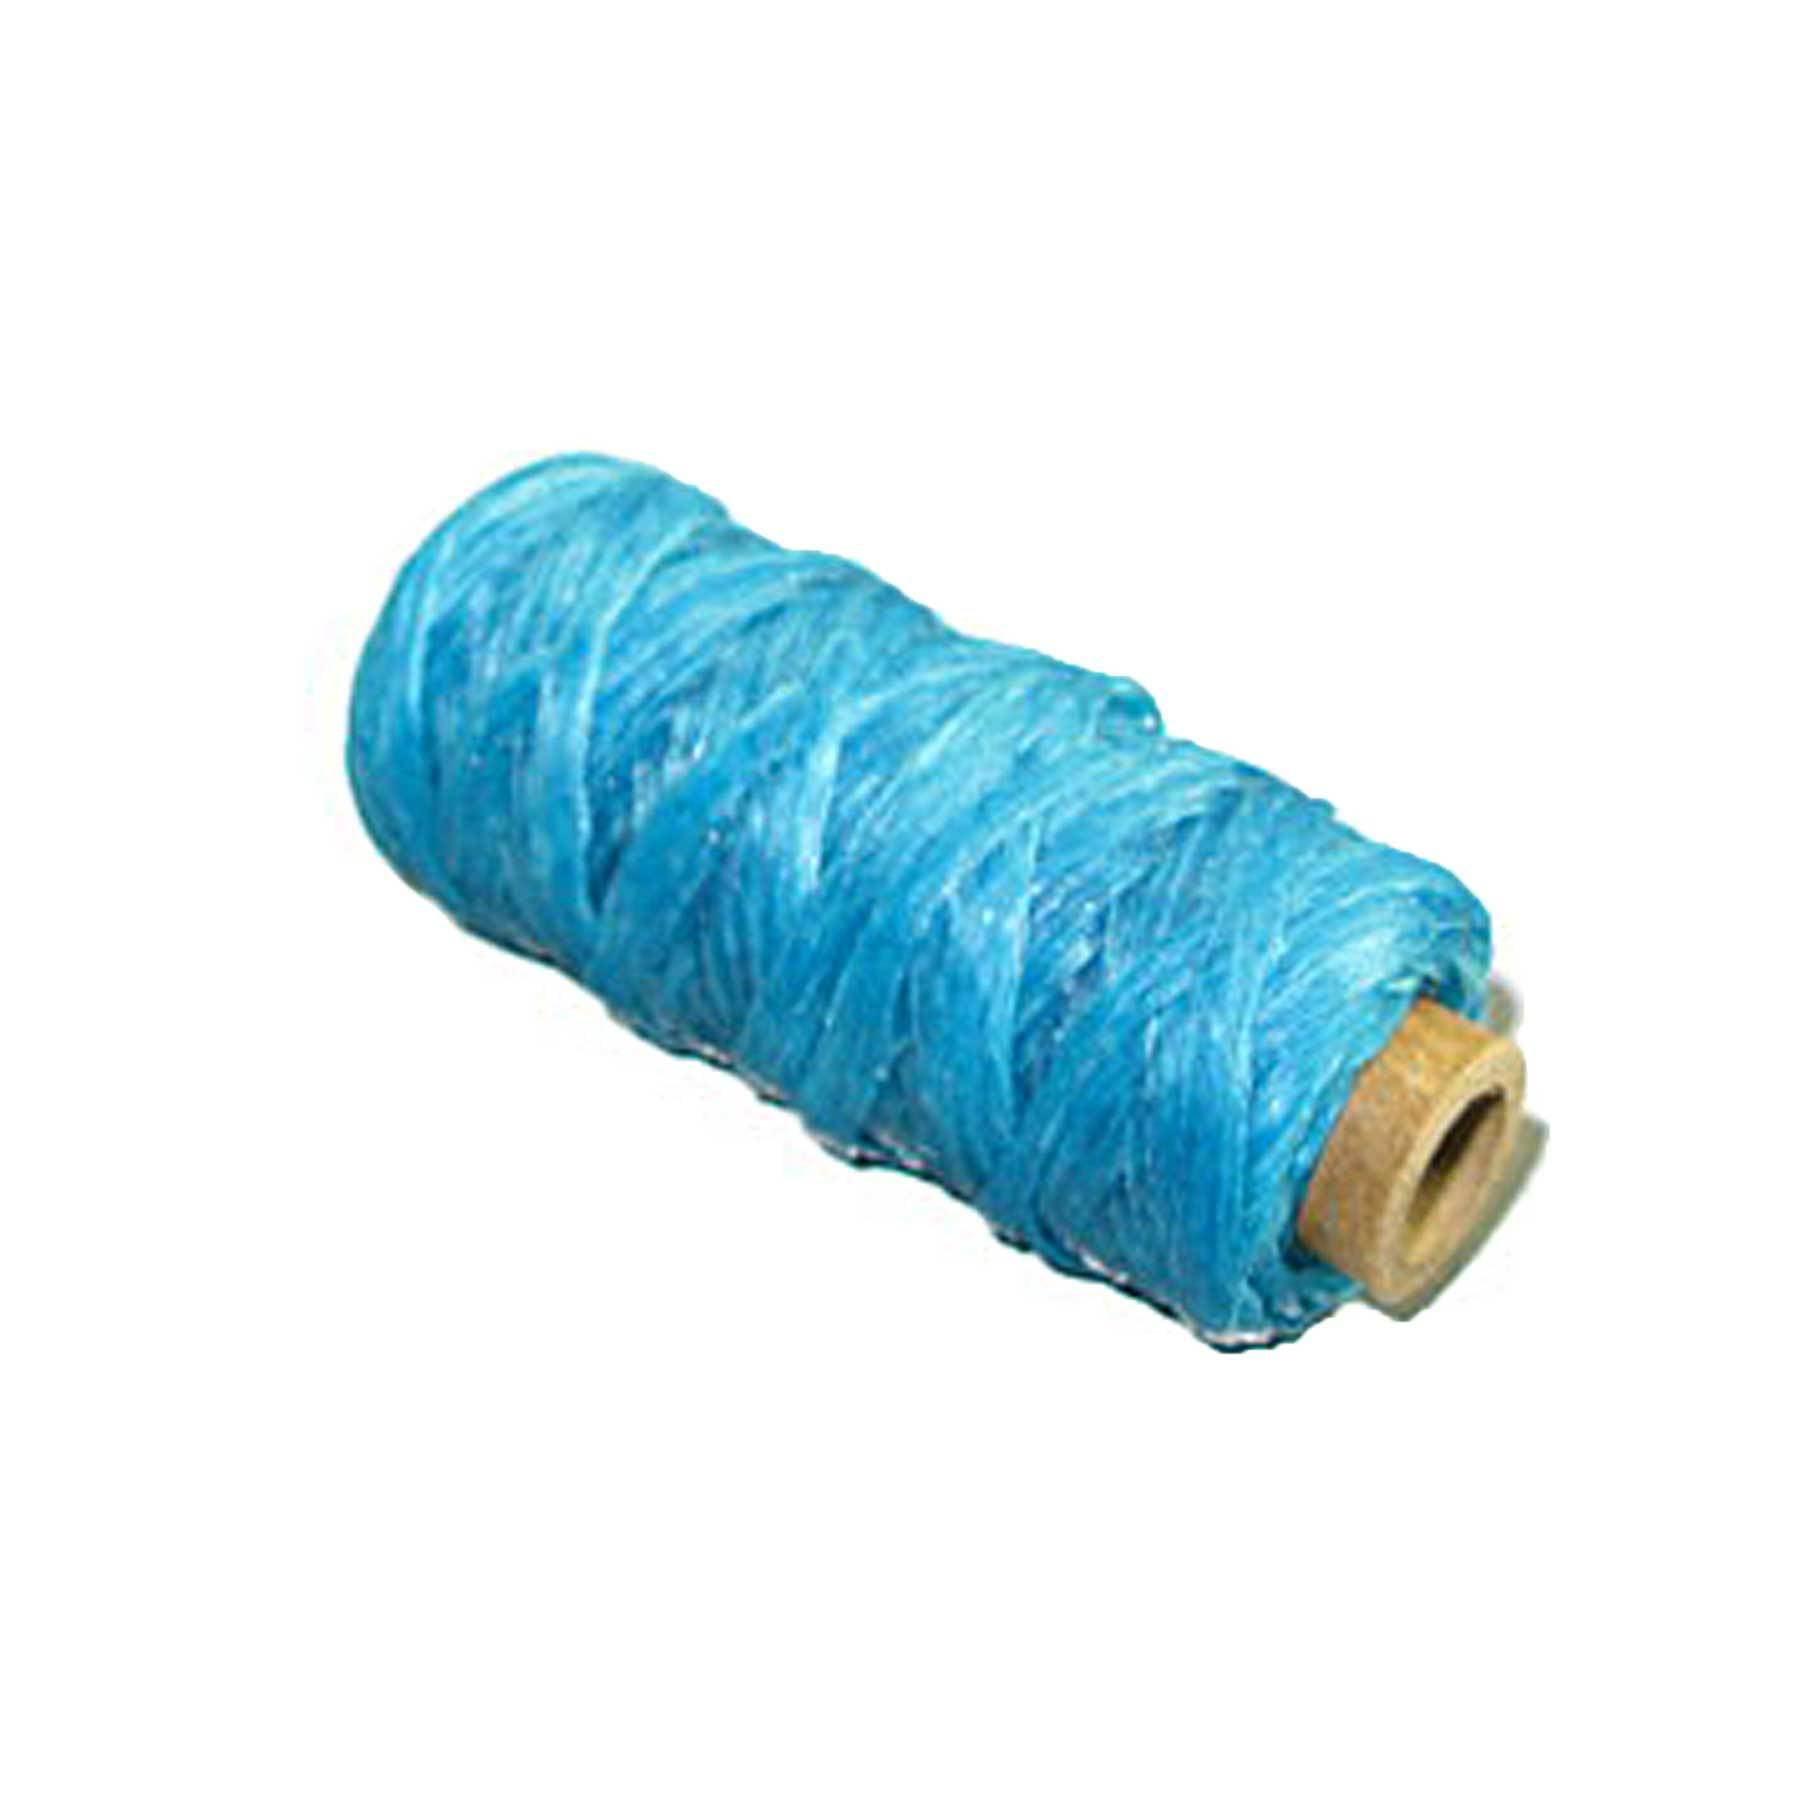 Red Artificial Sinew Bobbin 20 Yard 50 lb Test Waxed Beading Craft Thread